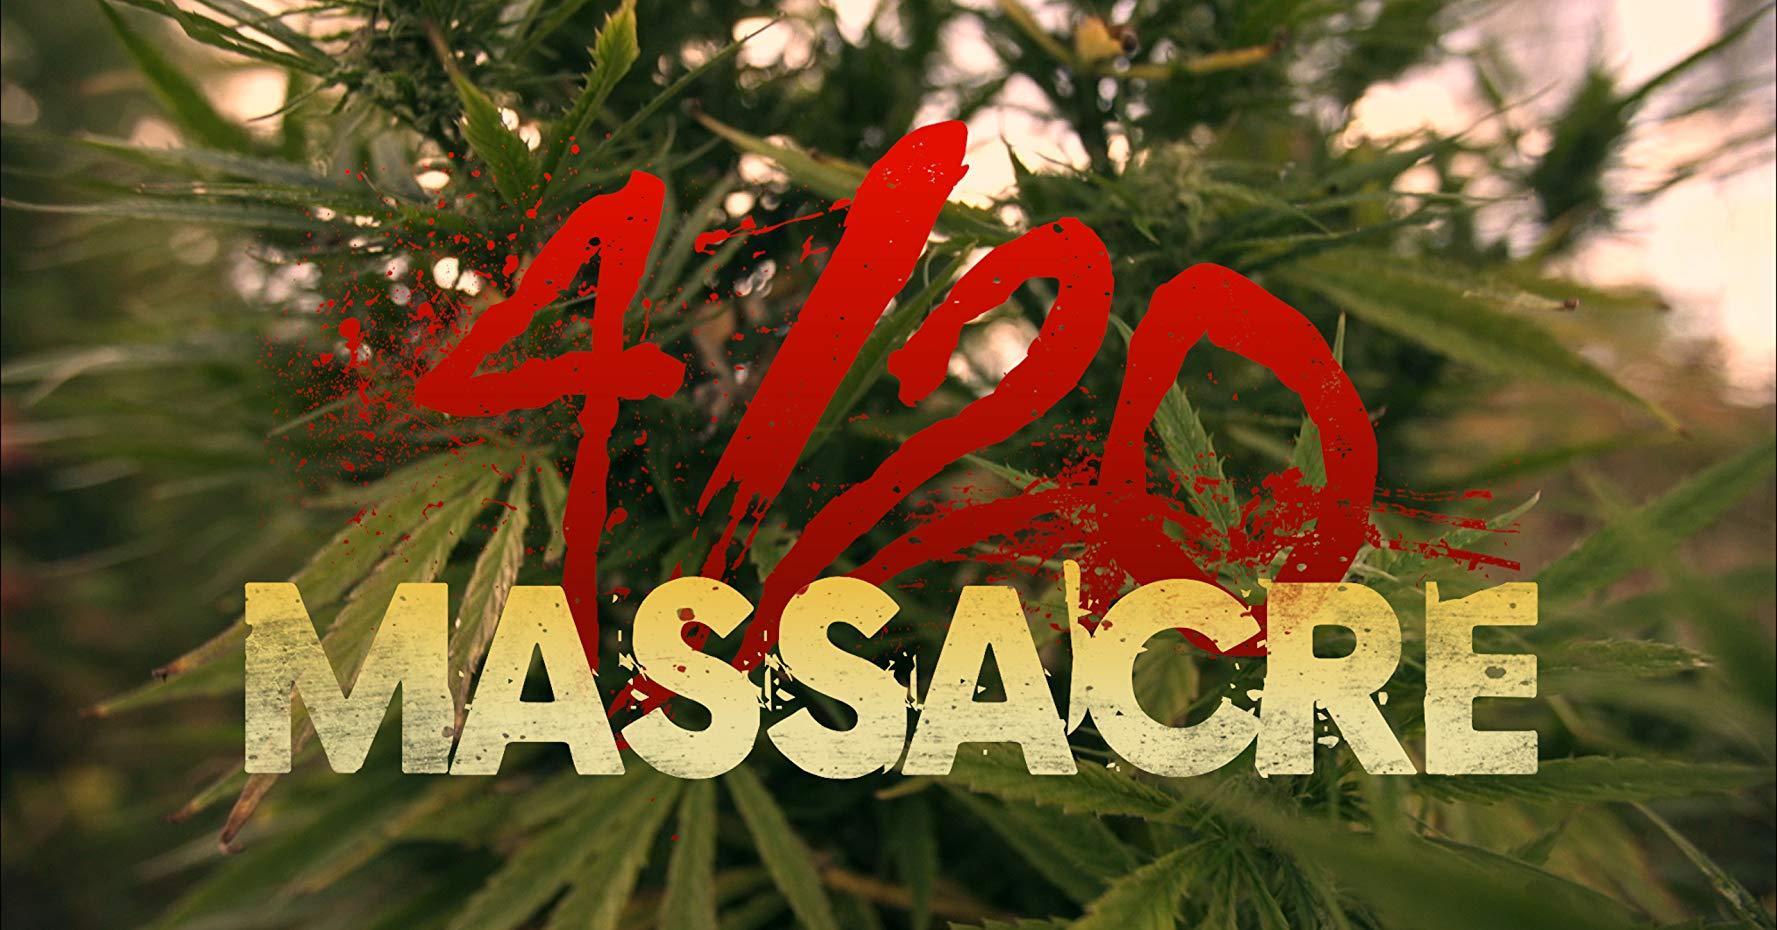 مشاهدة فيلم 4/20 Massacre 2018 HD مترجم كامل اون لاين